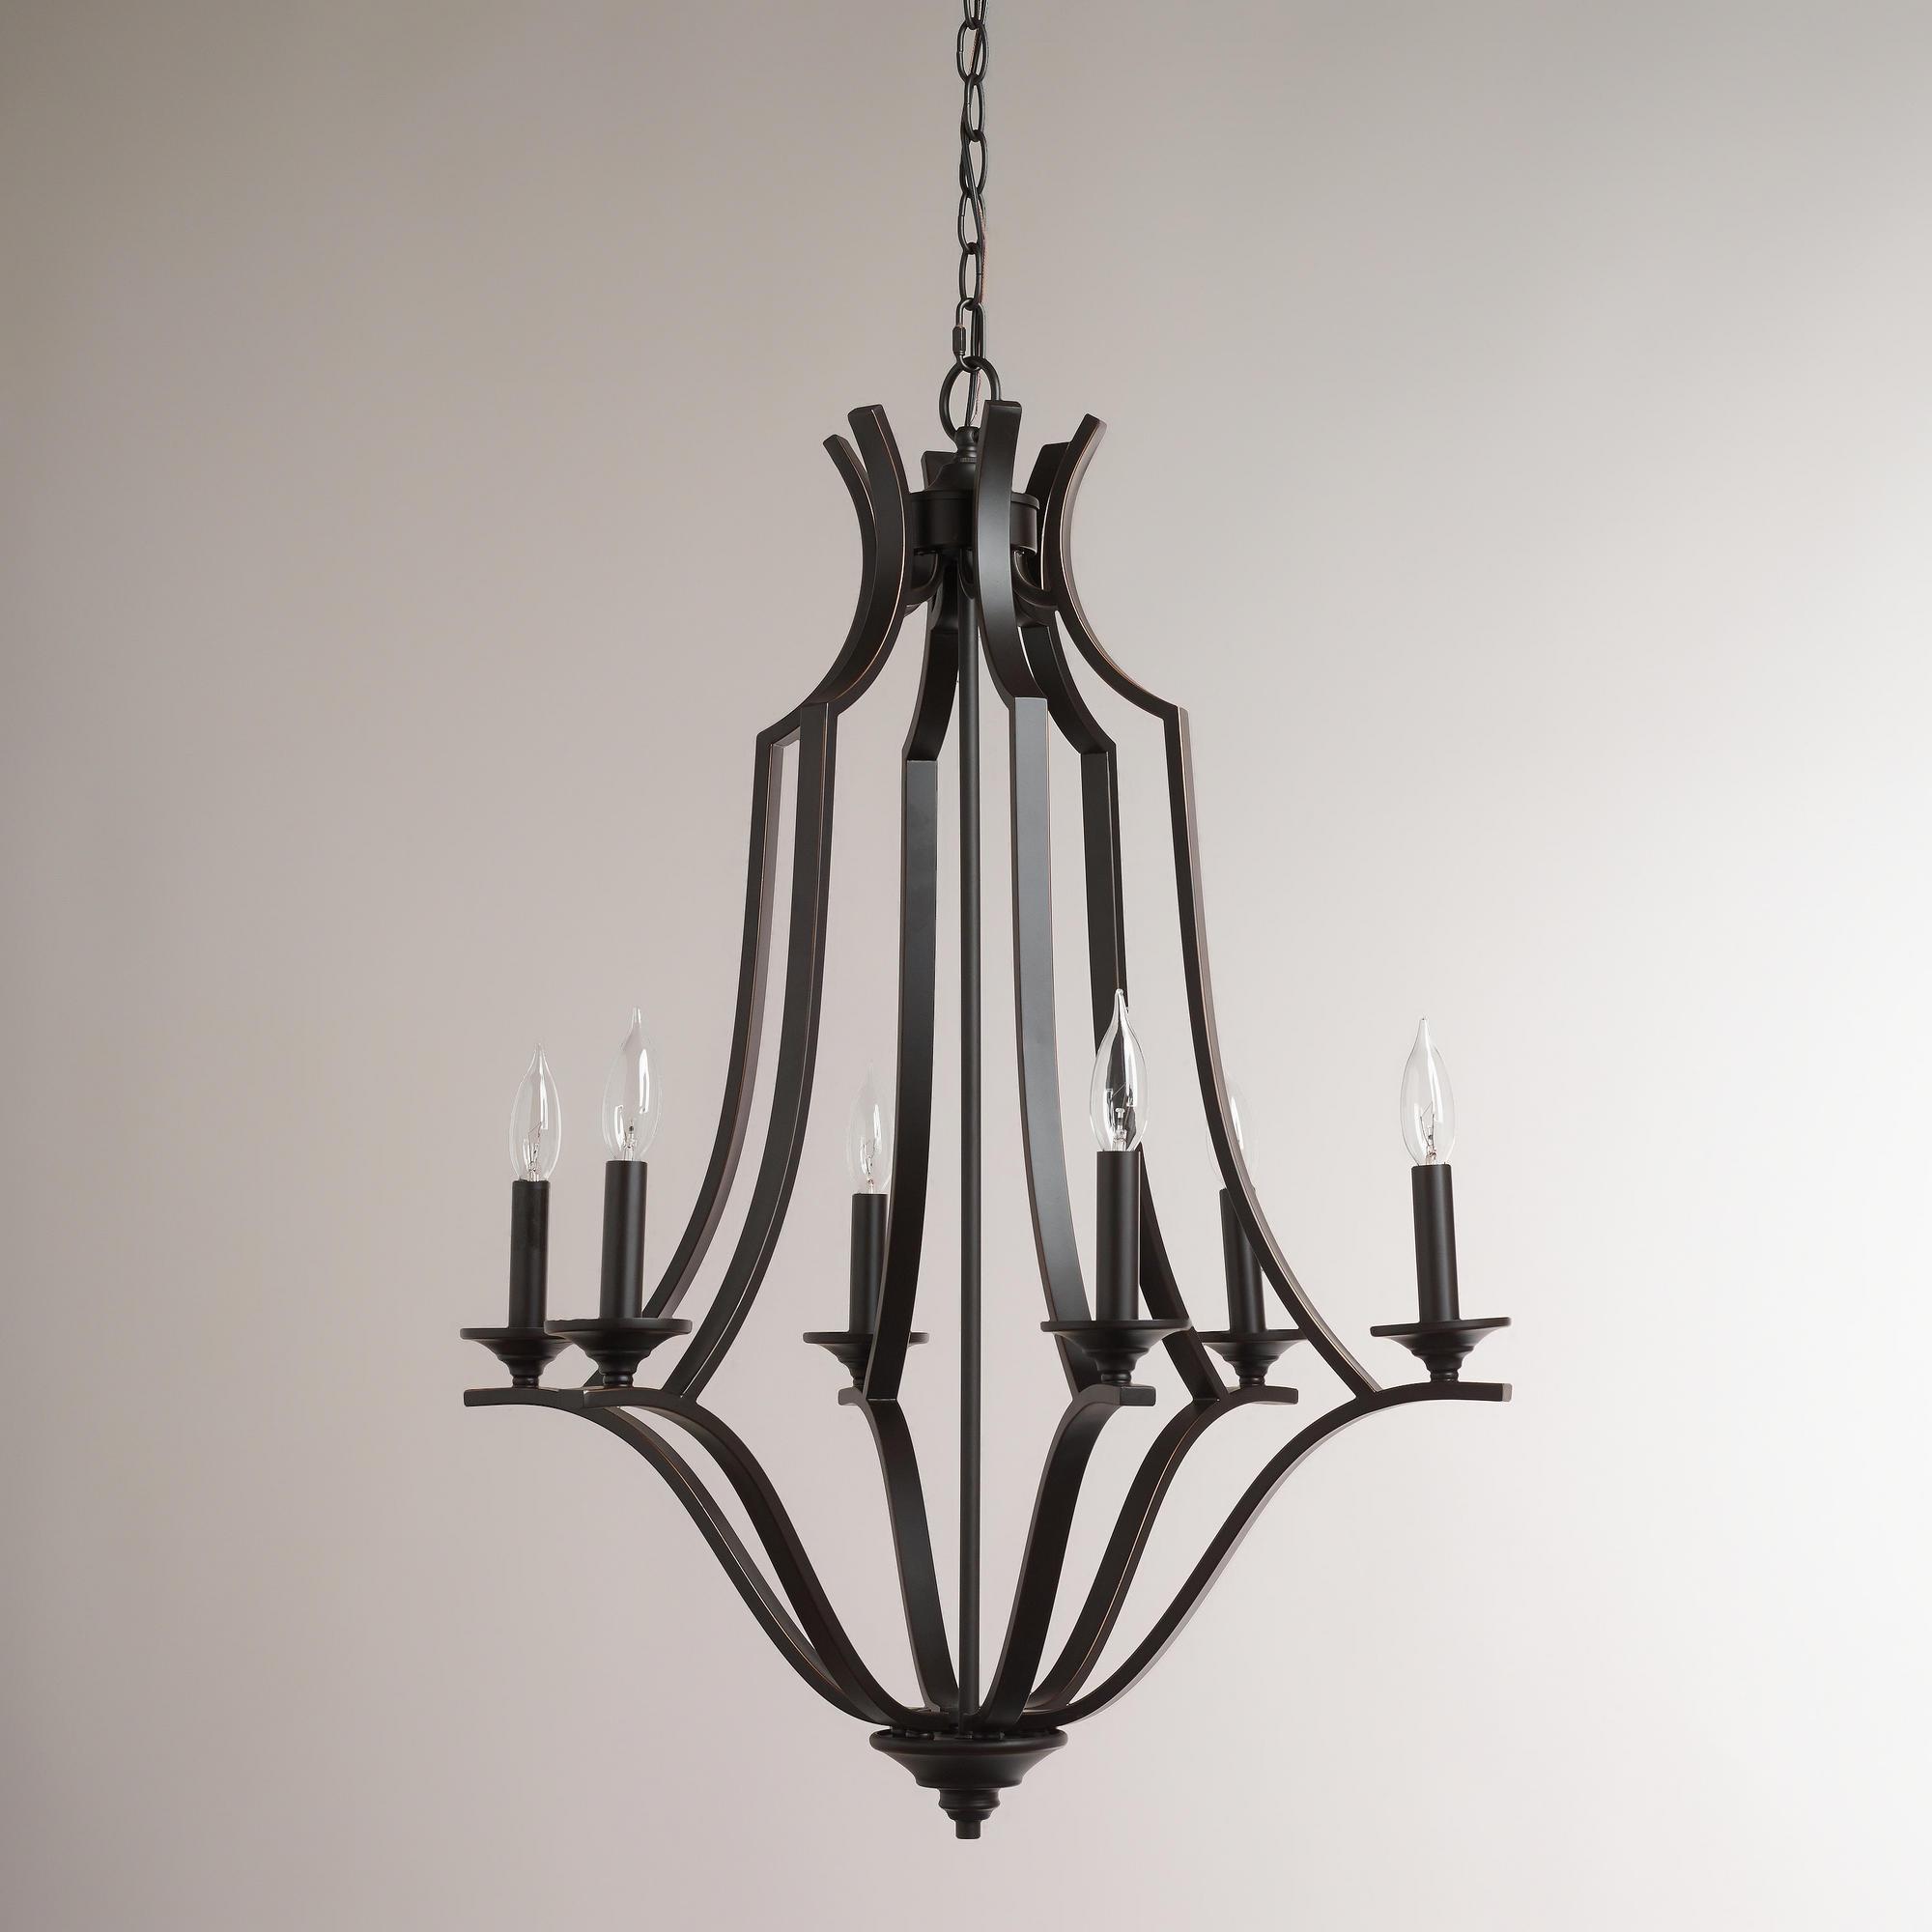 Online Shopping World Market Rardon Designrardon Design Regarding Large Iron Chandelier (View 5 of 12)